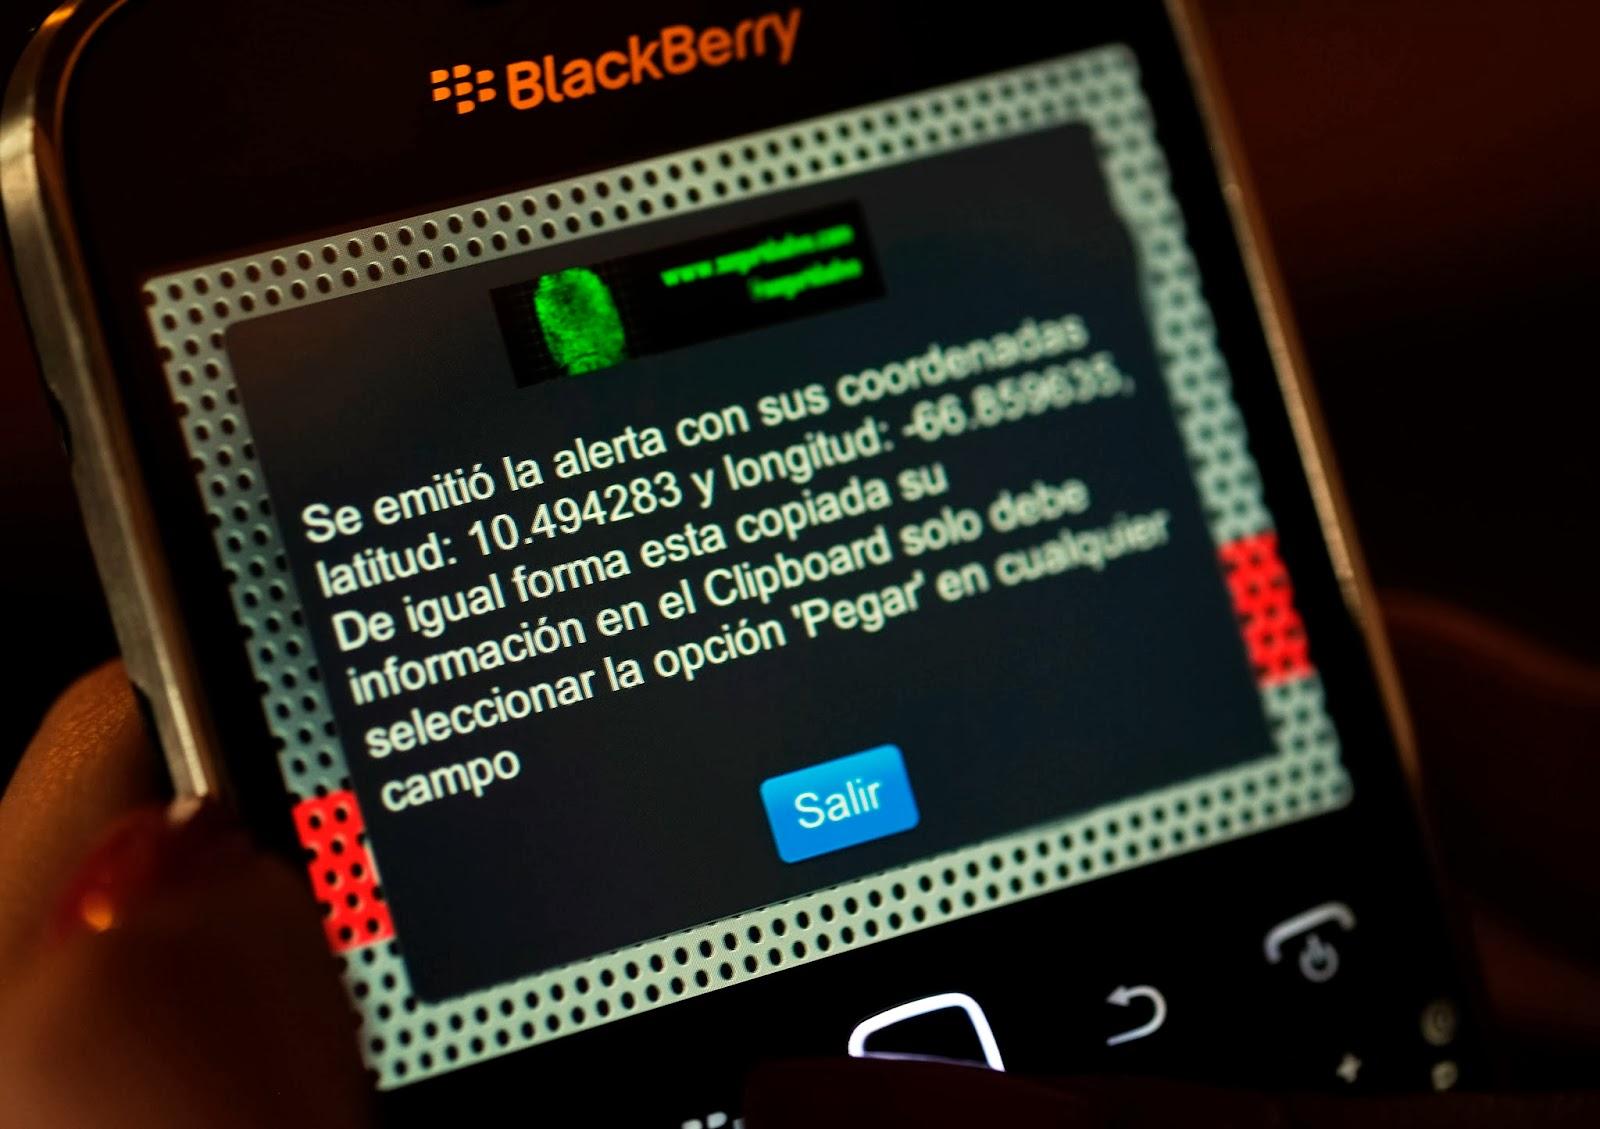 Cell Phone, Apple Mobile, Mobile, Smartphone, Police, Crime, App, Pocket Police, Panic button, Emergencies, Venezuela, Launch, Violent, Caracas, Blackberry, Technology, News,